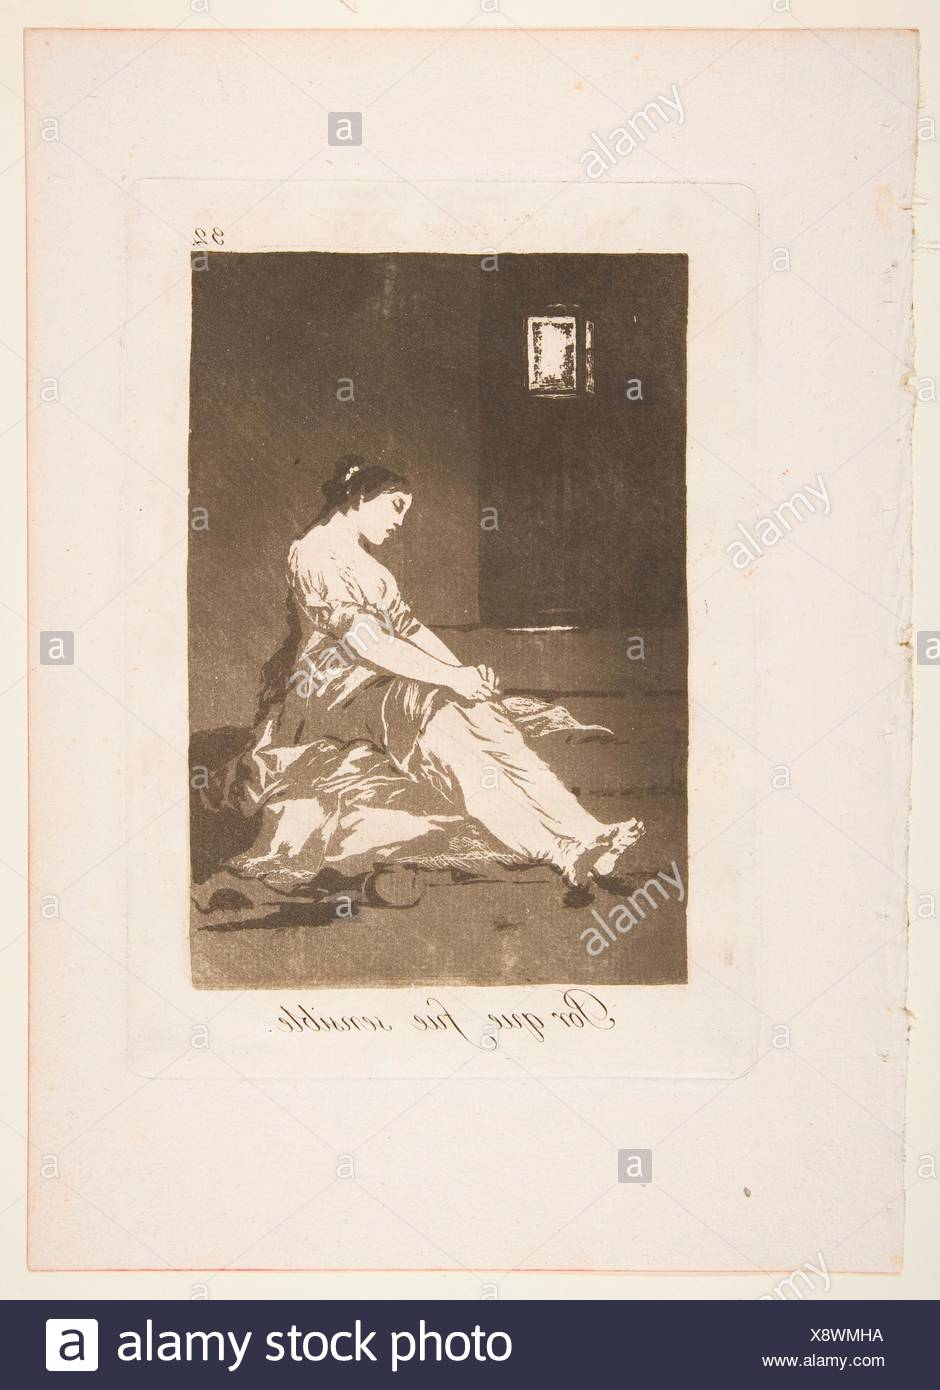 Platte 32 von 'Los Caprichos': Weil sie anfällig war (Por que fue sinnvoll.). Serie/Portfolio: Los Capricho; Artist: Goya (Francisco de Goya y Stockbild